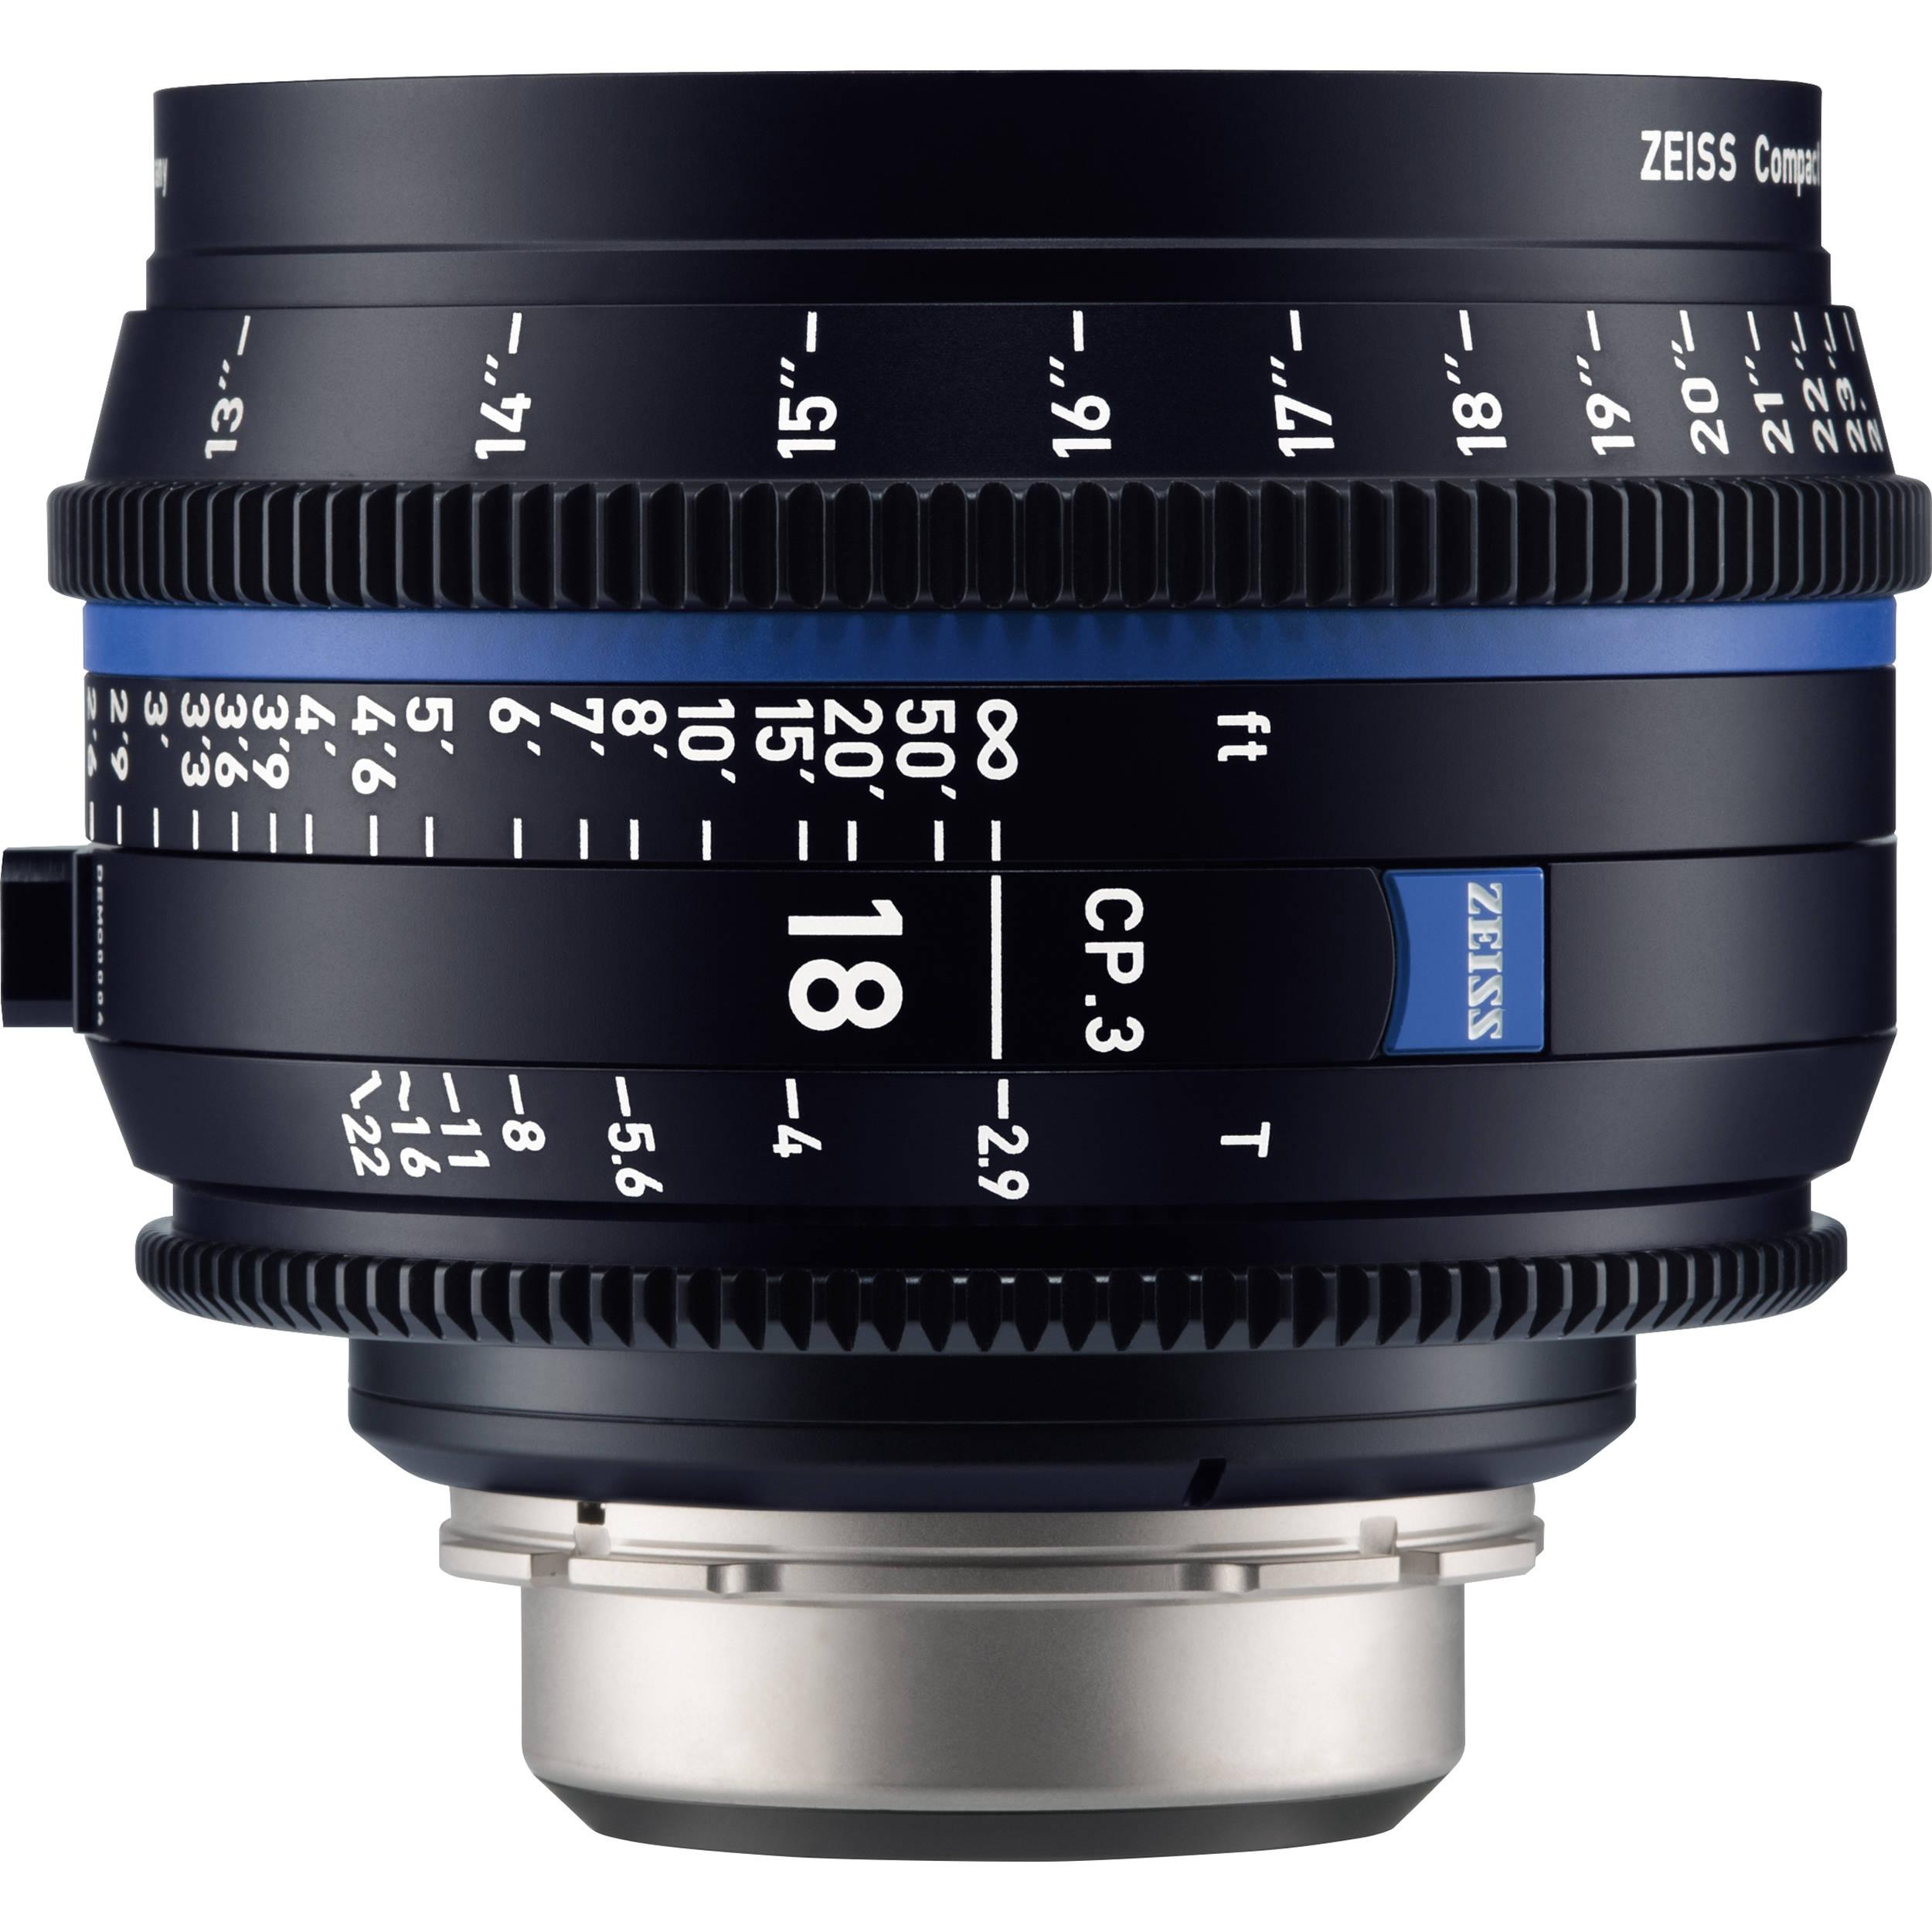 Zeiss 18mm f/2.8 Milvus Lens Review